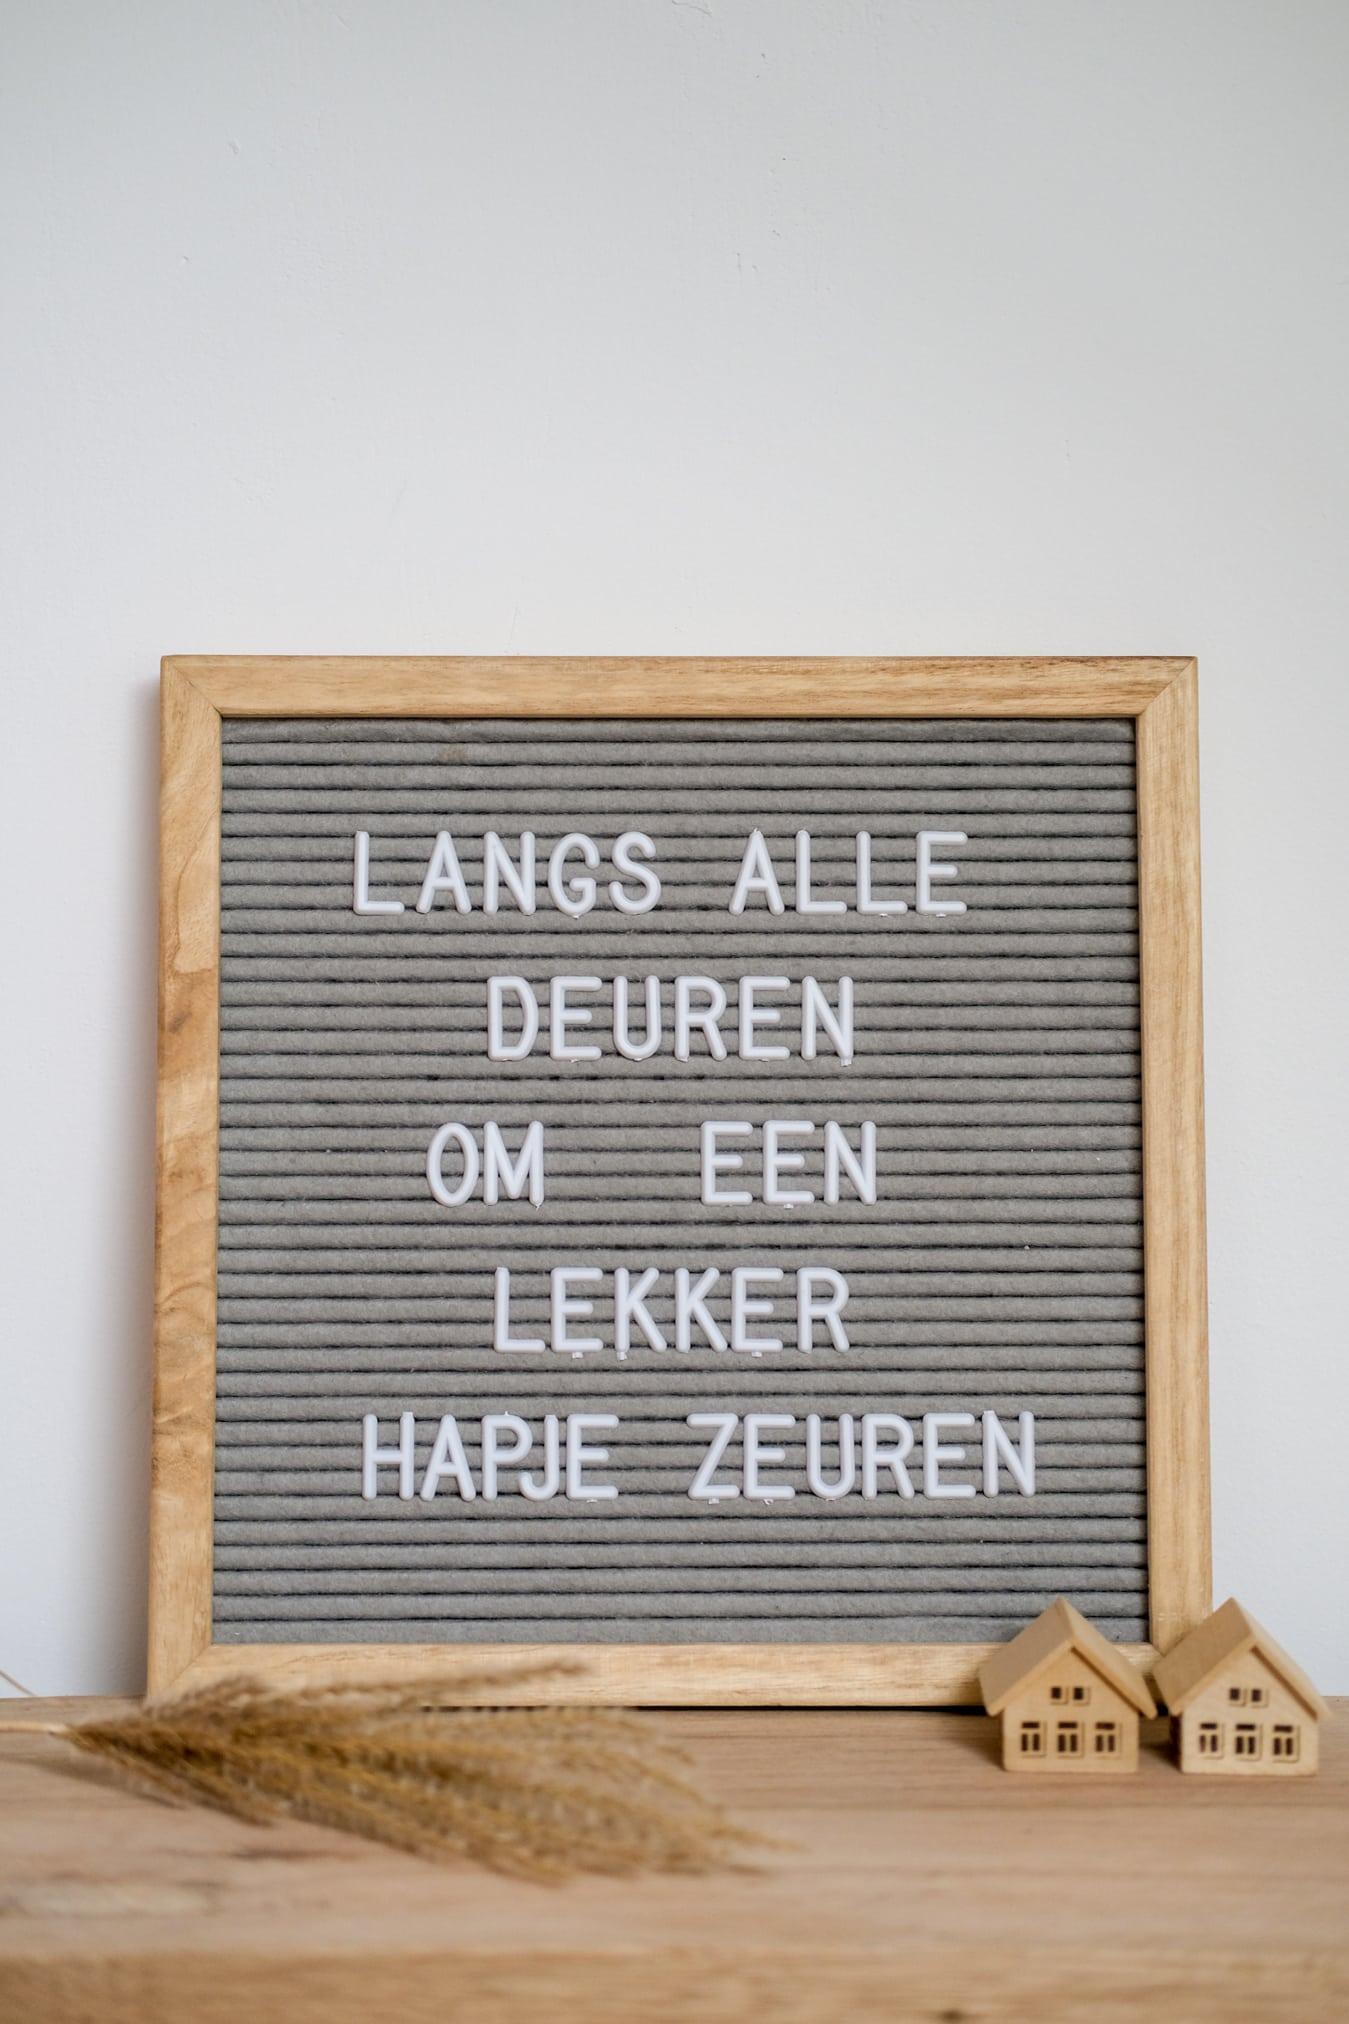 letterbord quotes over sint maarten